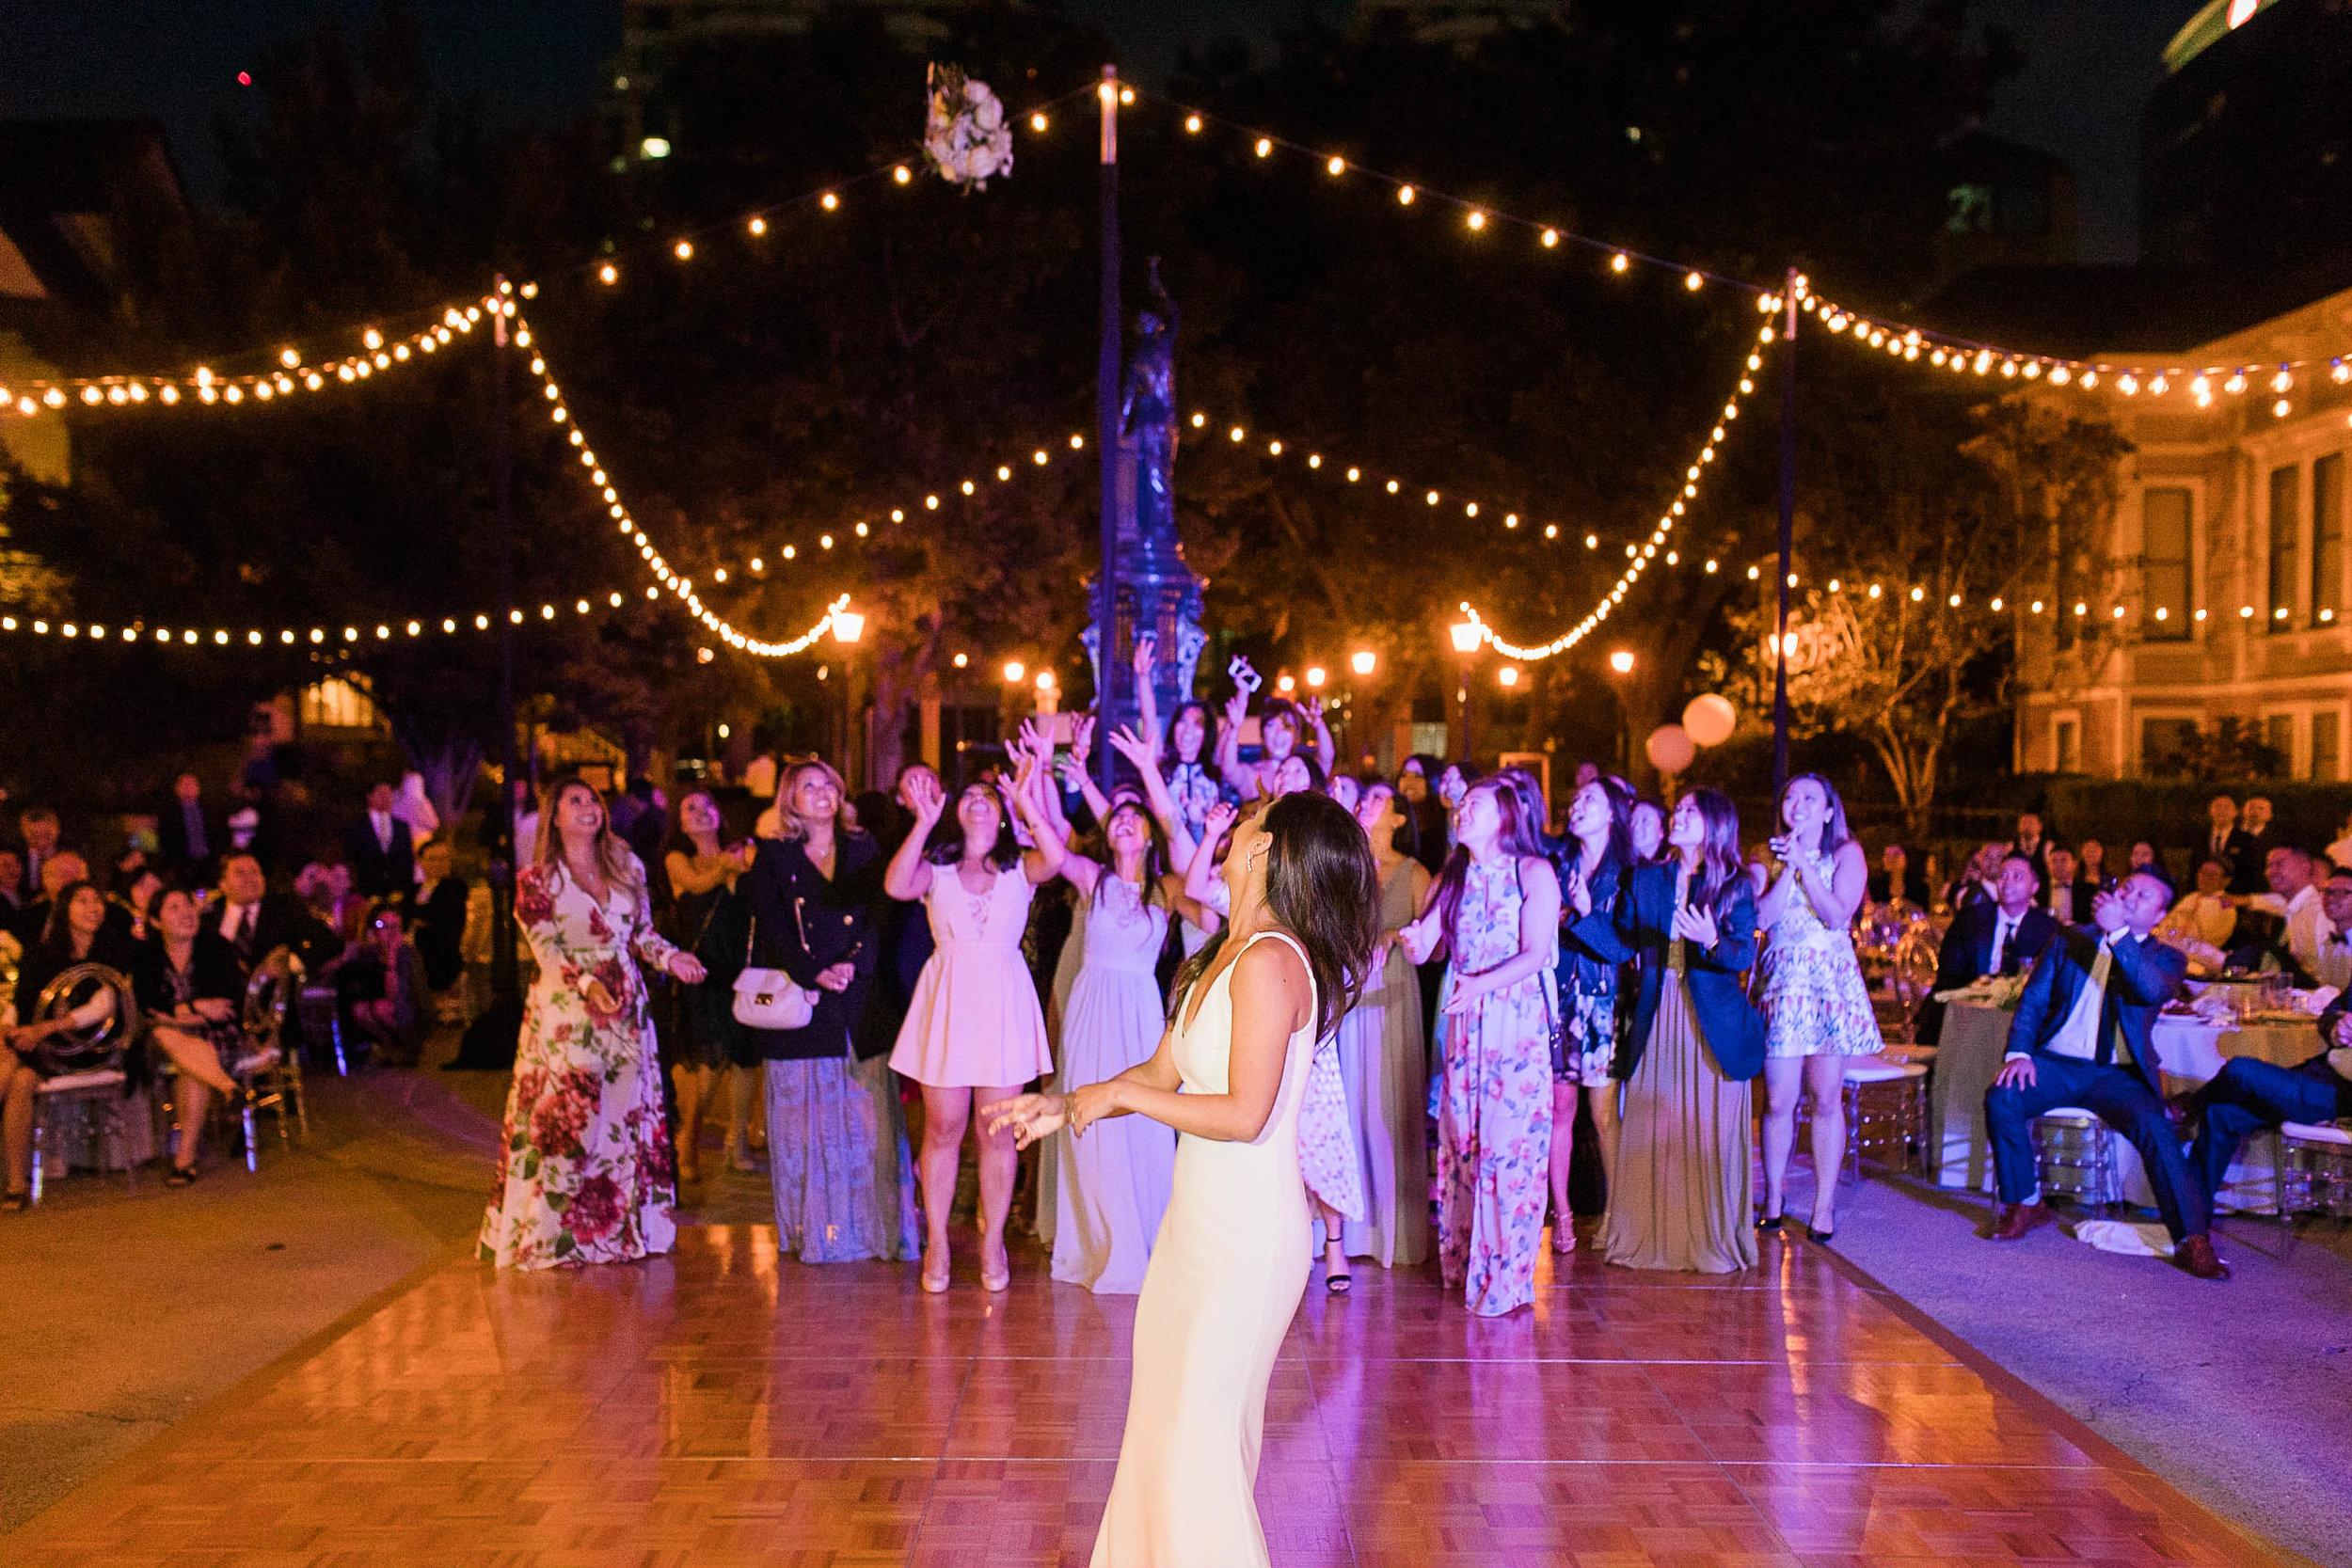 Wedding at Preservation Park in Oakland - Preservation Park Wedding Photos by JBJ Pictures San Francisco Photographer (62).jpg